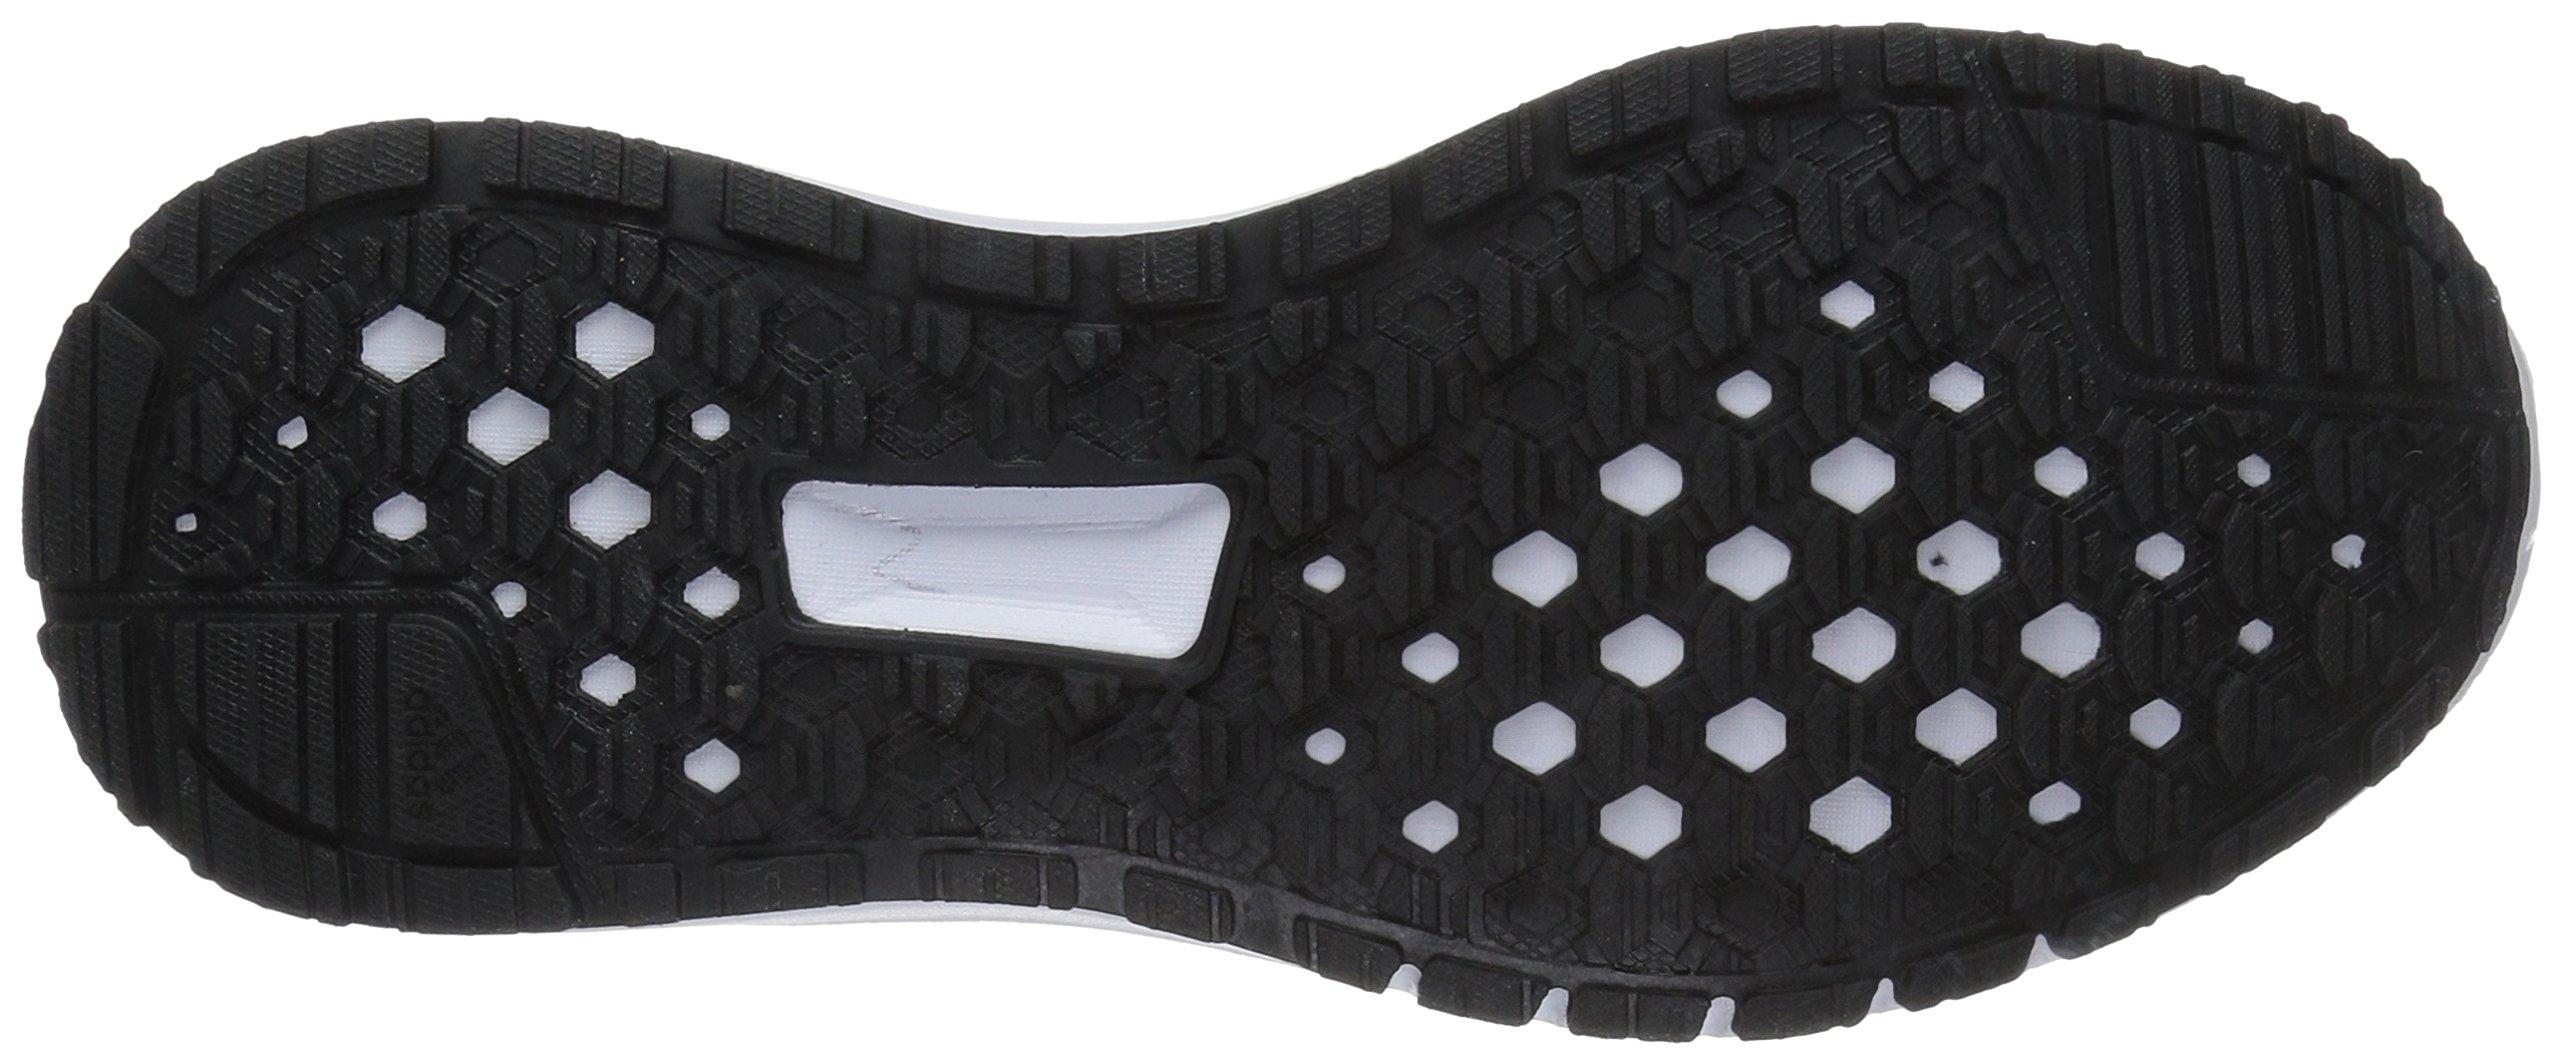 adidas  Men's Energy Cloud Wide m Running Shoe, BLACK/UTILITY BLACK/WHITE, 10.5 2E US by adidas (Image #3)